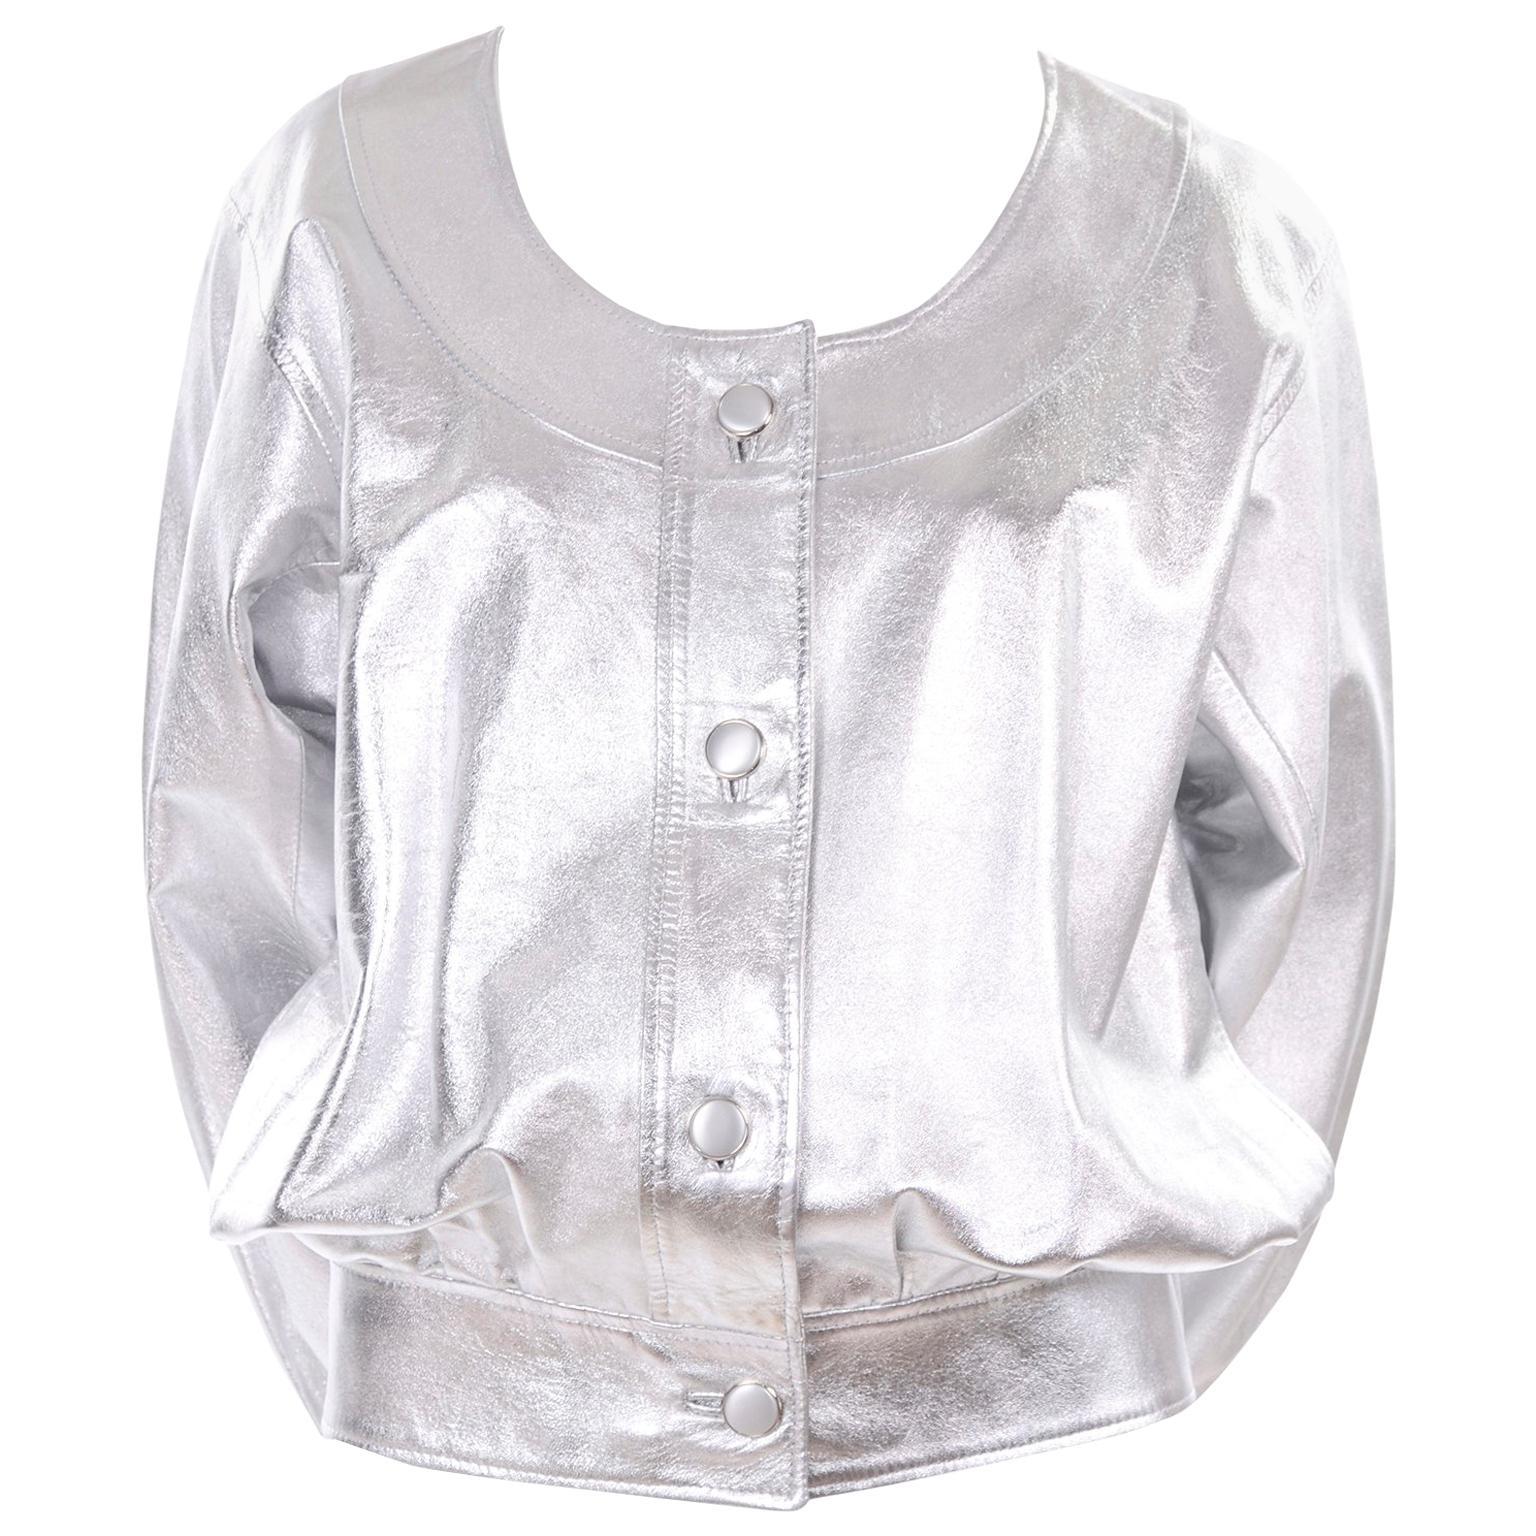 Yves Saint Laurent Silver Leather YSL Vintage Jacket